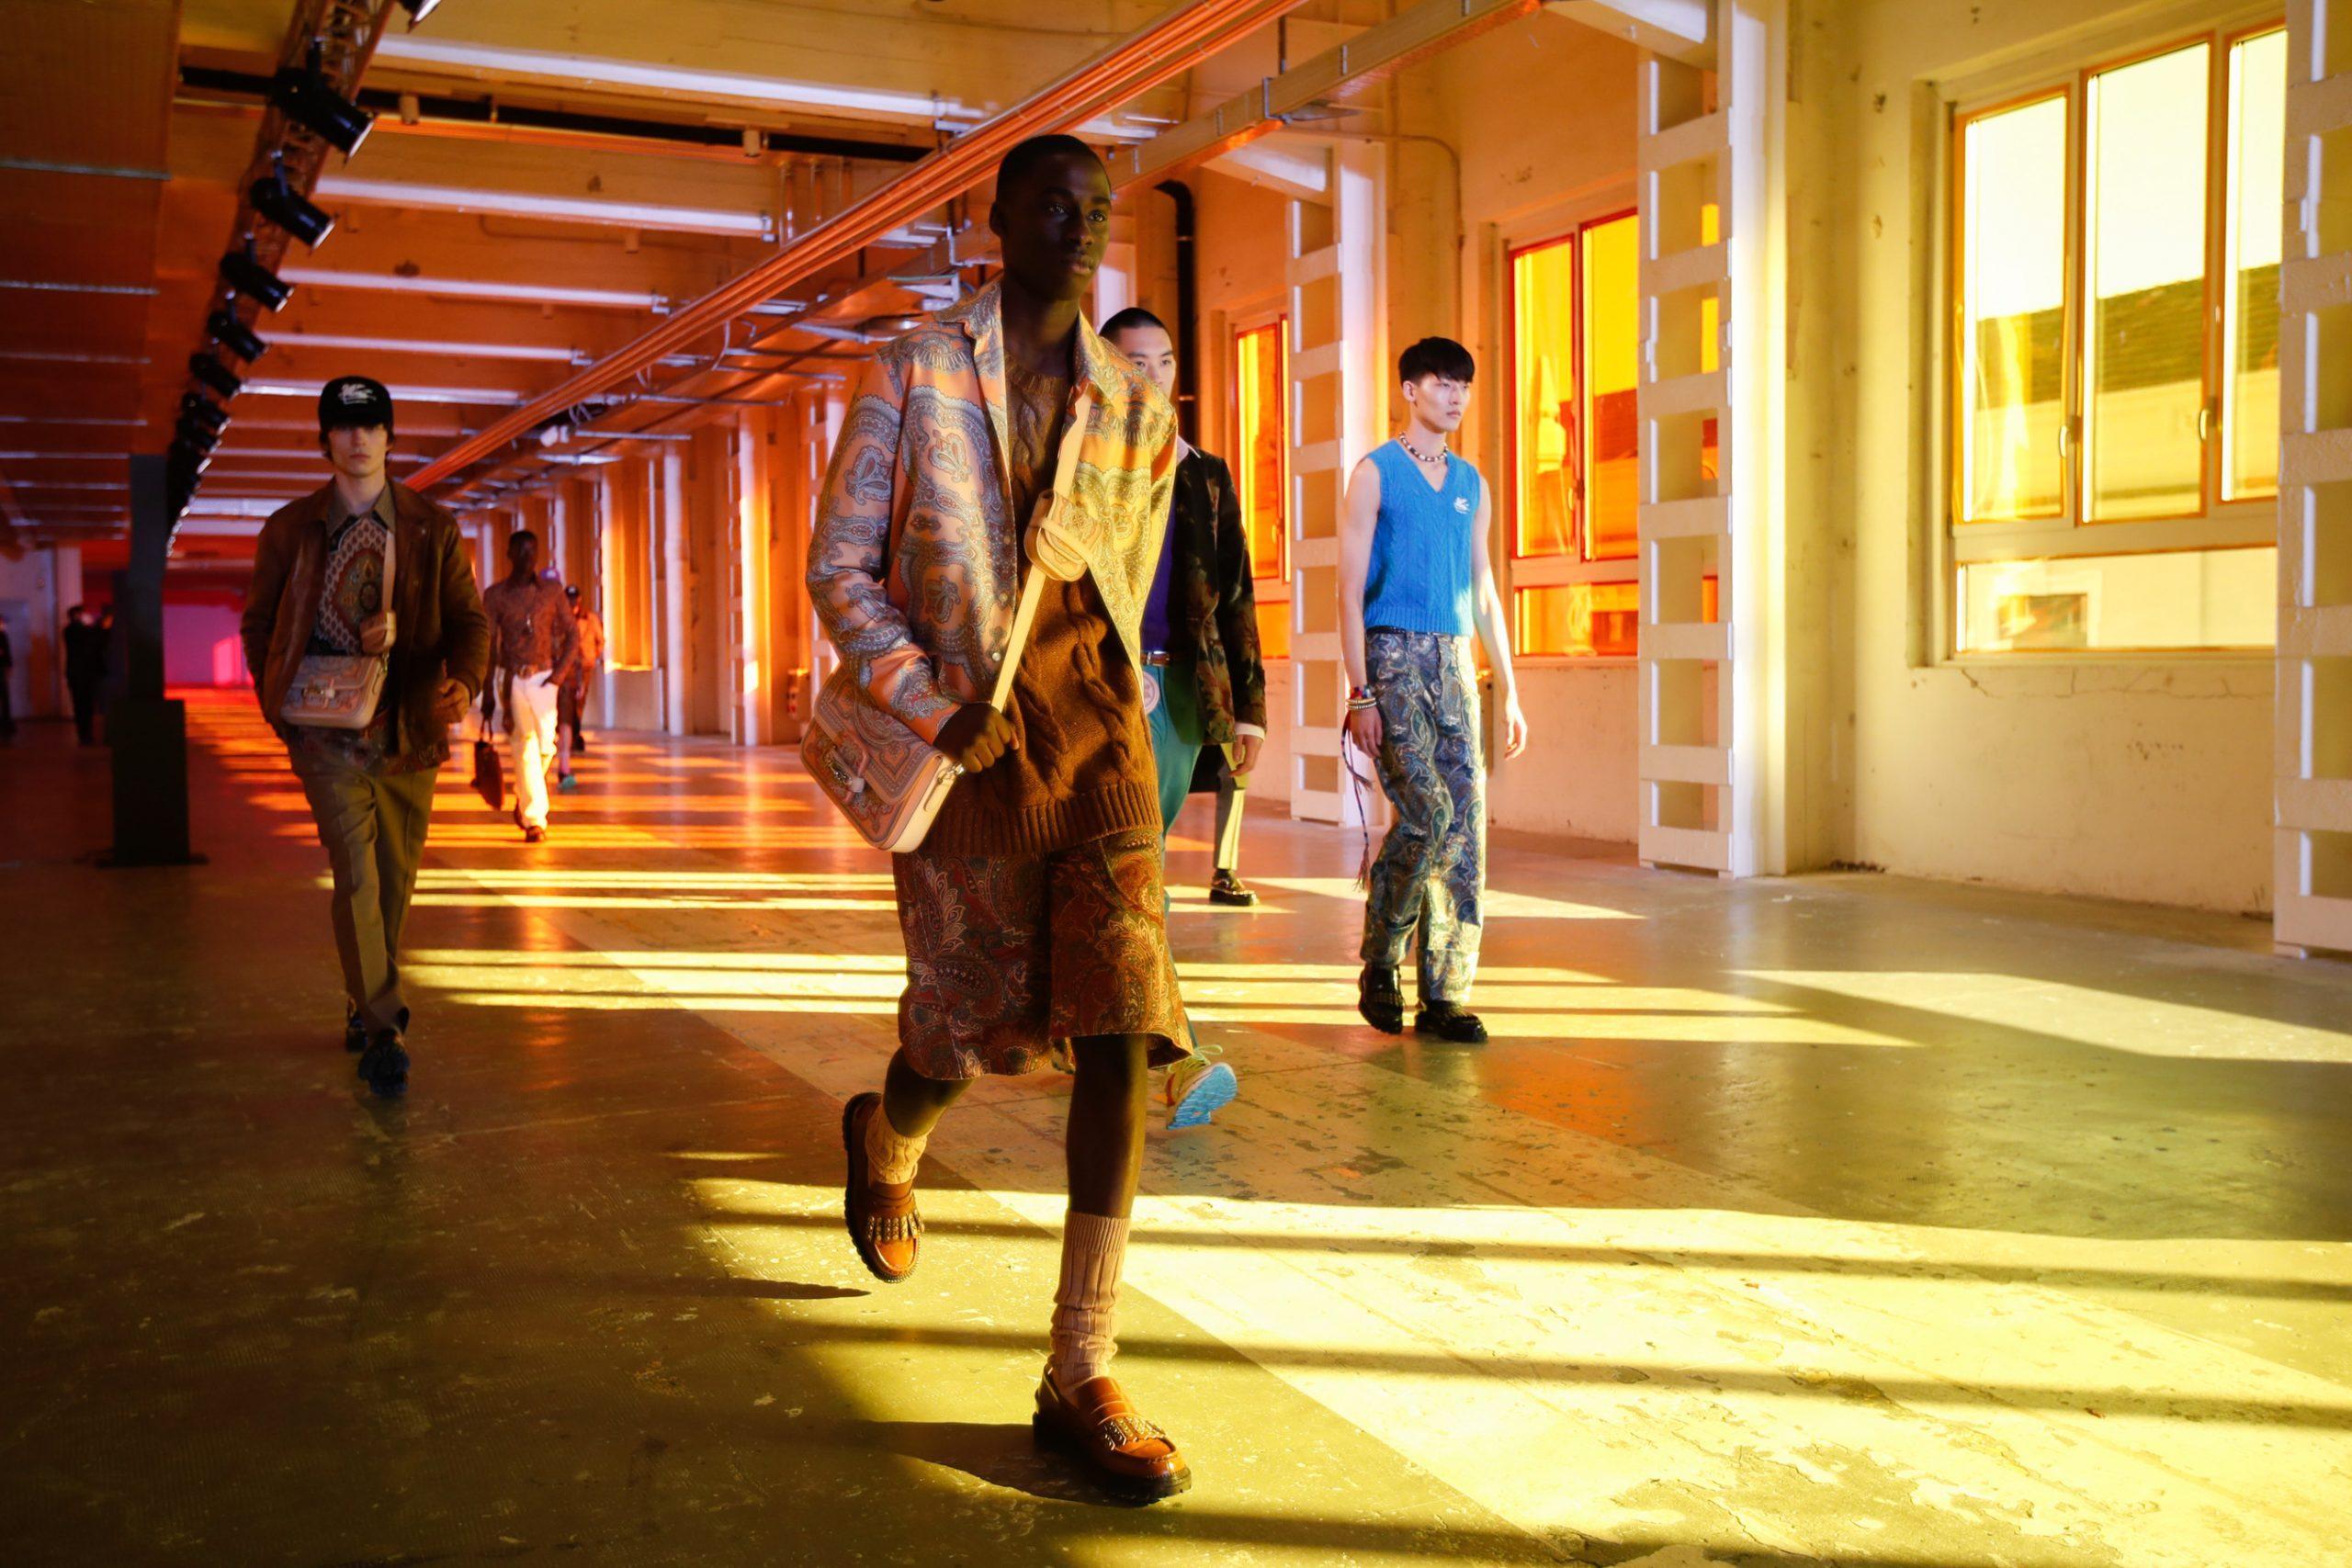 Review of Tokyo James, Etro, MSGM, & Sunnei Men's Fall 2021 Fashion Shows